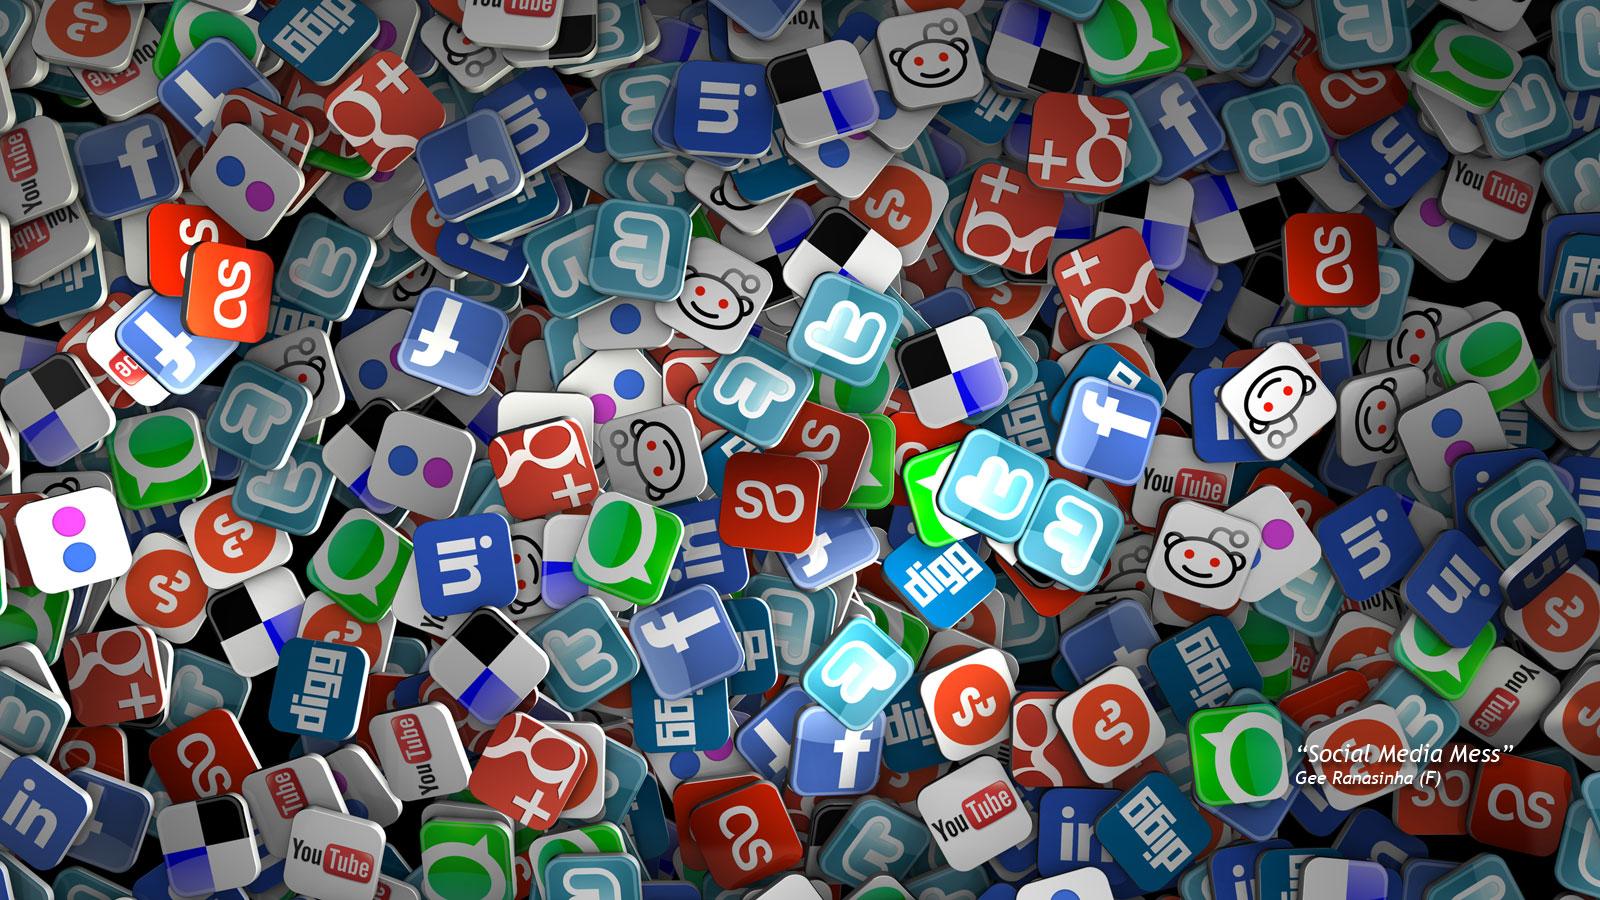 Social Media All User Hd For Wallpapers Desktop Wallpapers Gallery 1600x900